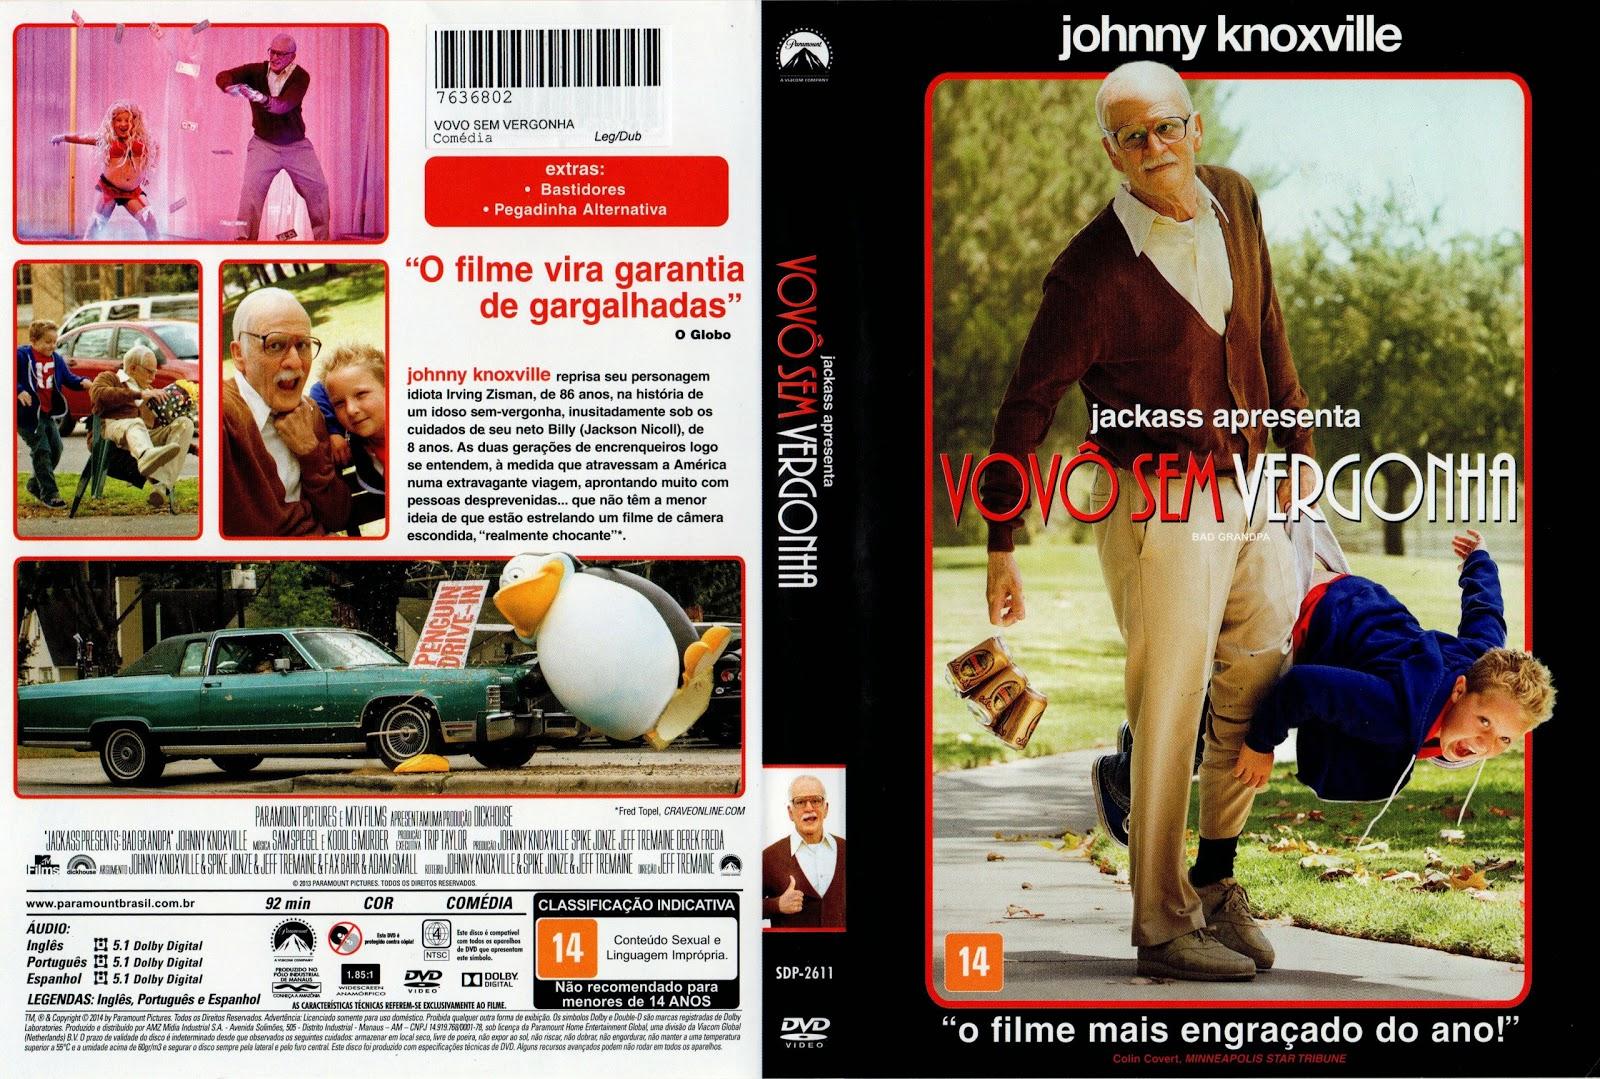 Capa DVD Vovô Sem Vergonha